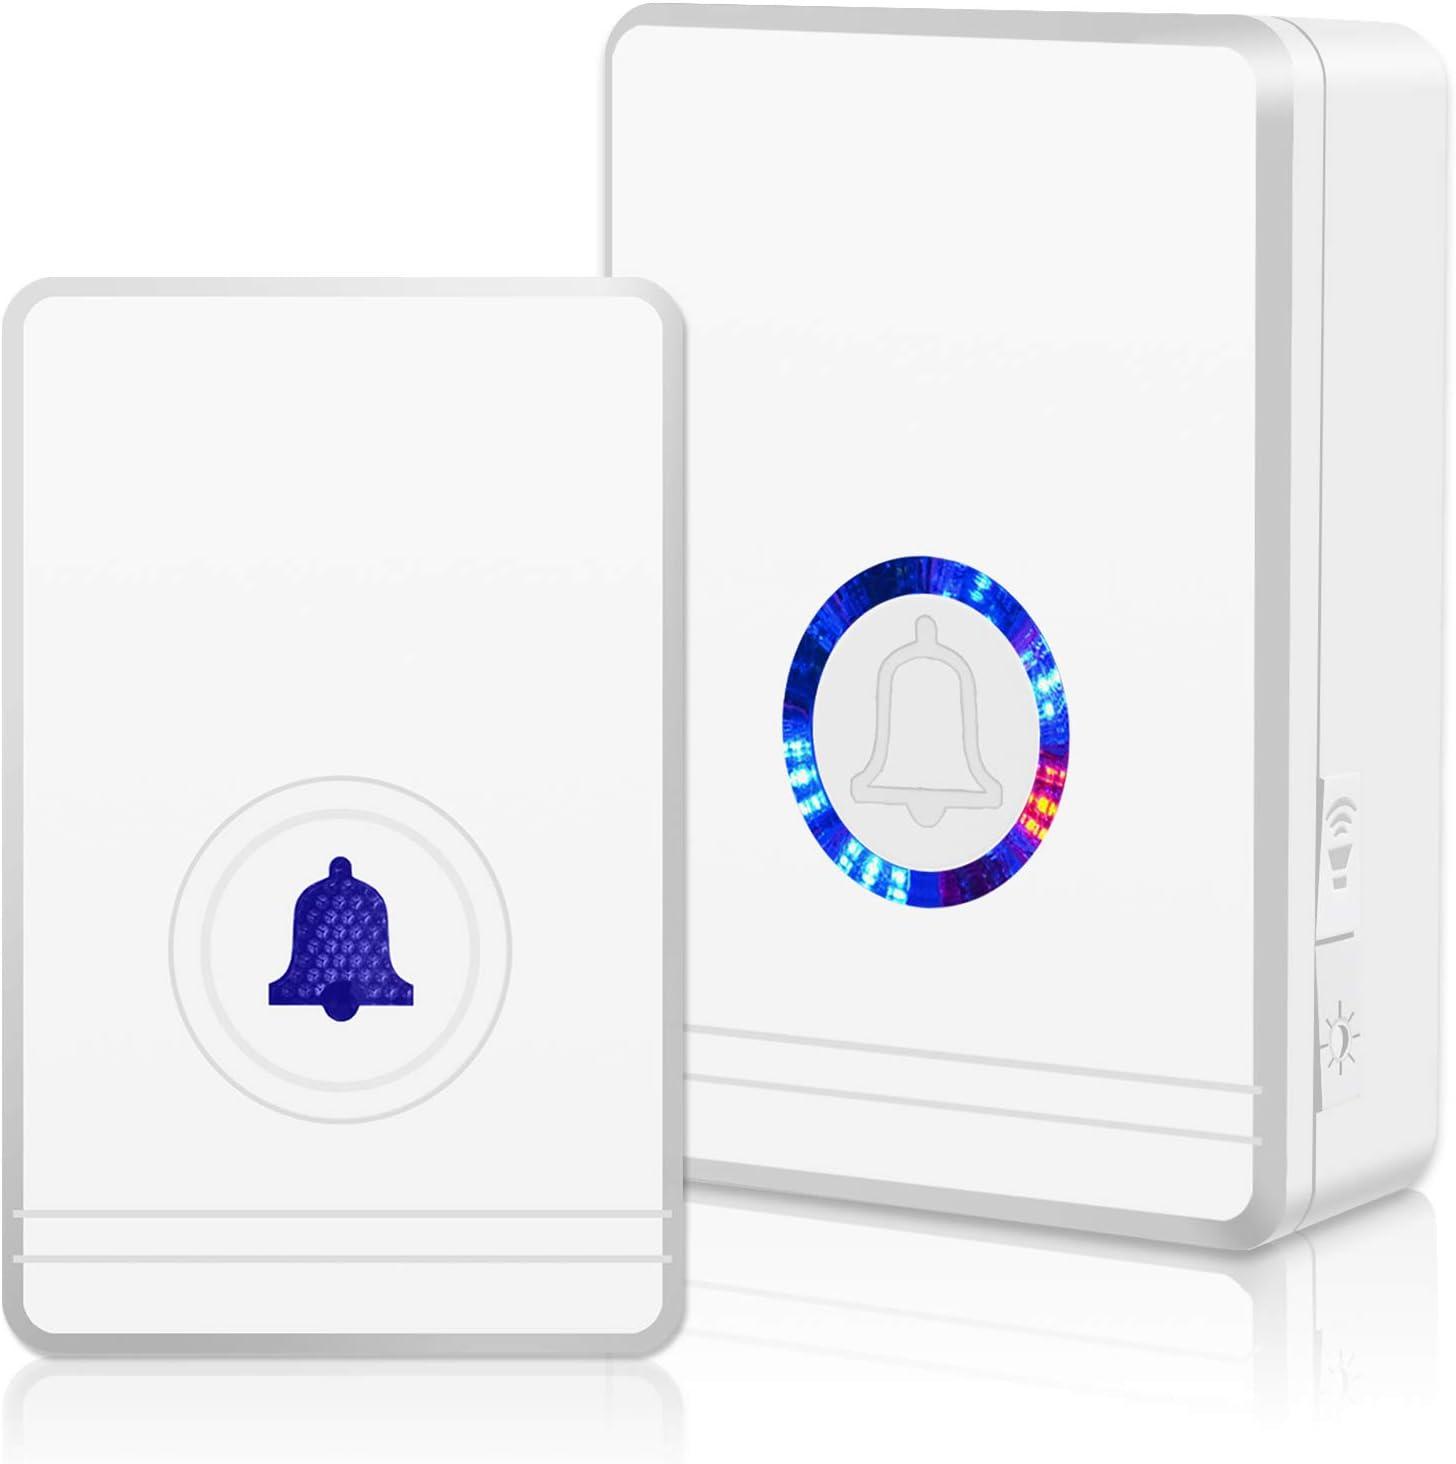 GREENCYCLE 1 Set Wireless Doorbell Door Open Chime, 1312ft Long Range, Adjustable Volume 48 Chimes with LED Flash Door Chime, IP 66 Waterproof Doorbell Button for Home Classroom Office Business